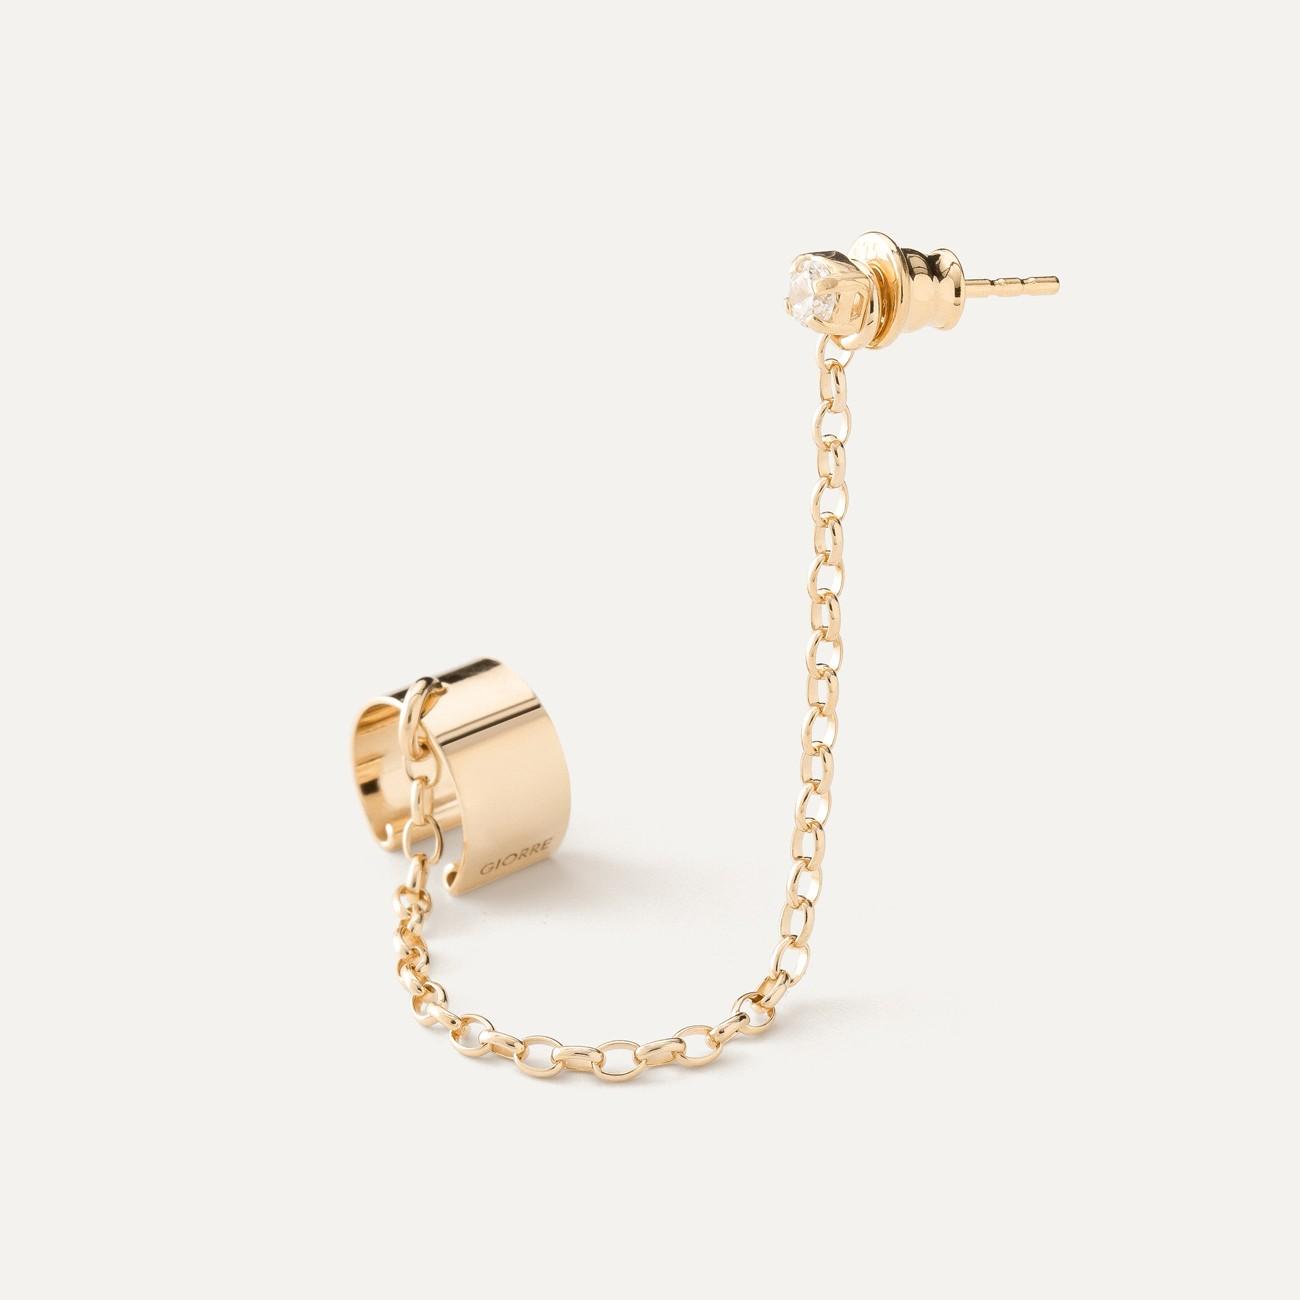 Chain earrings POLAR STAR sterling silver 925